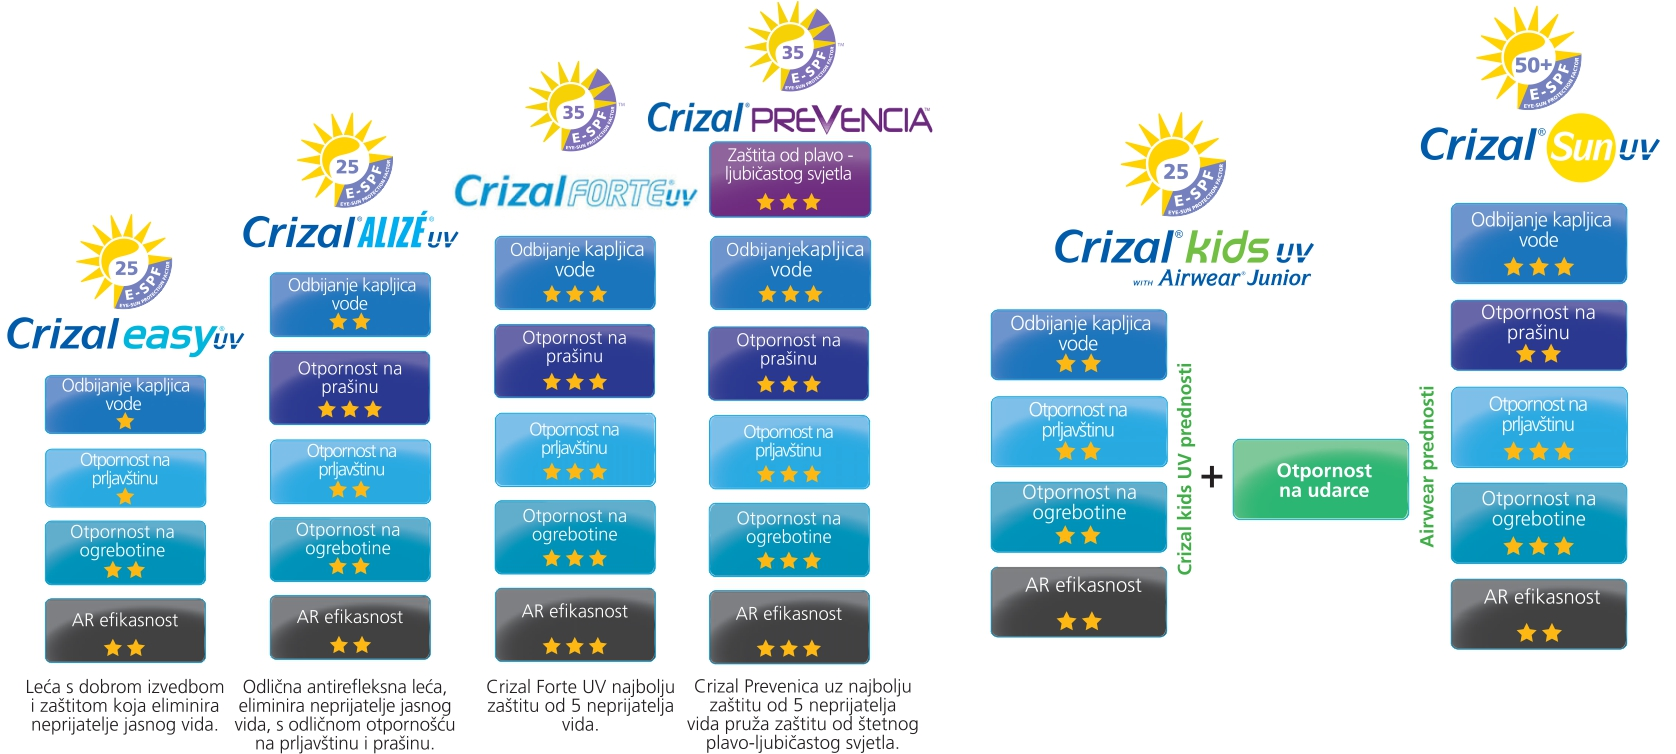 crizal-uv-raspon-1674-px